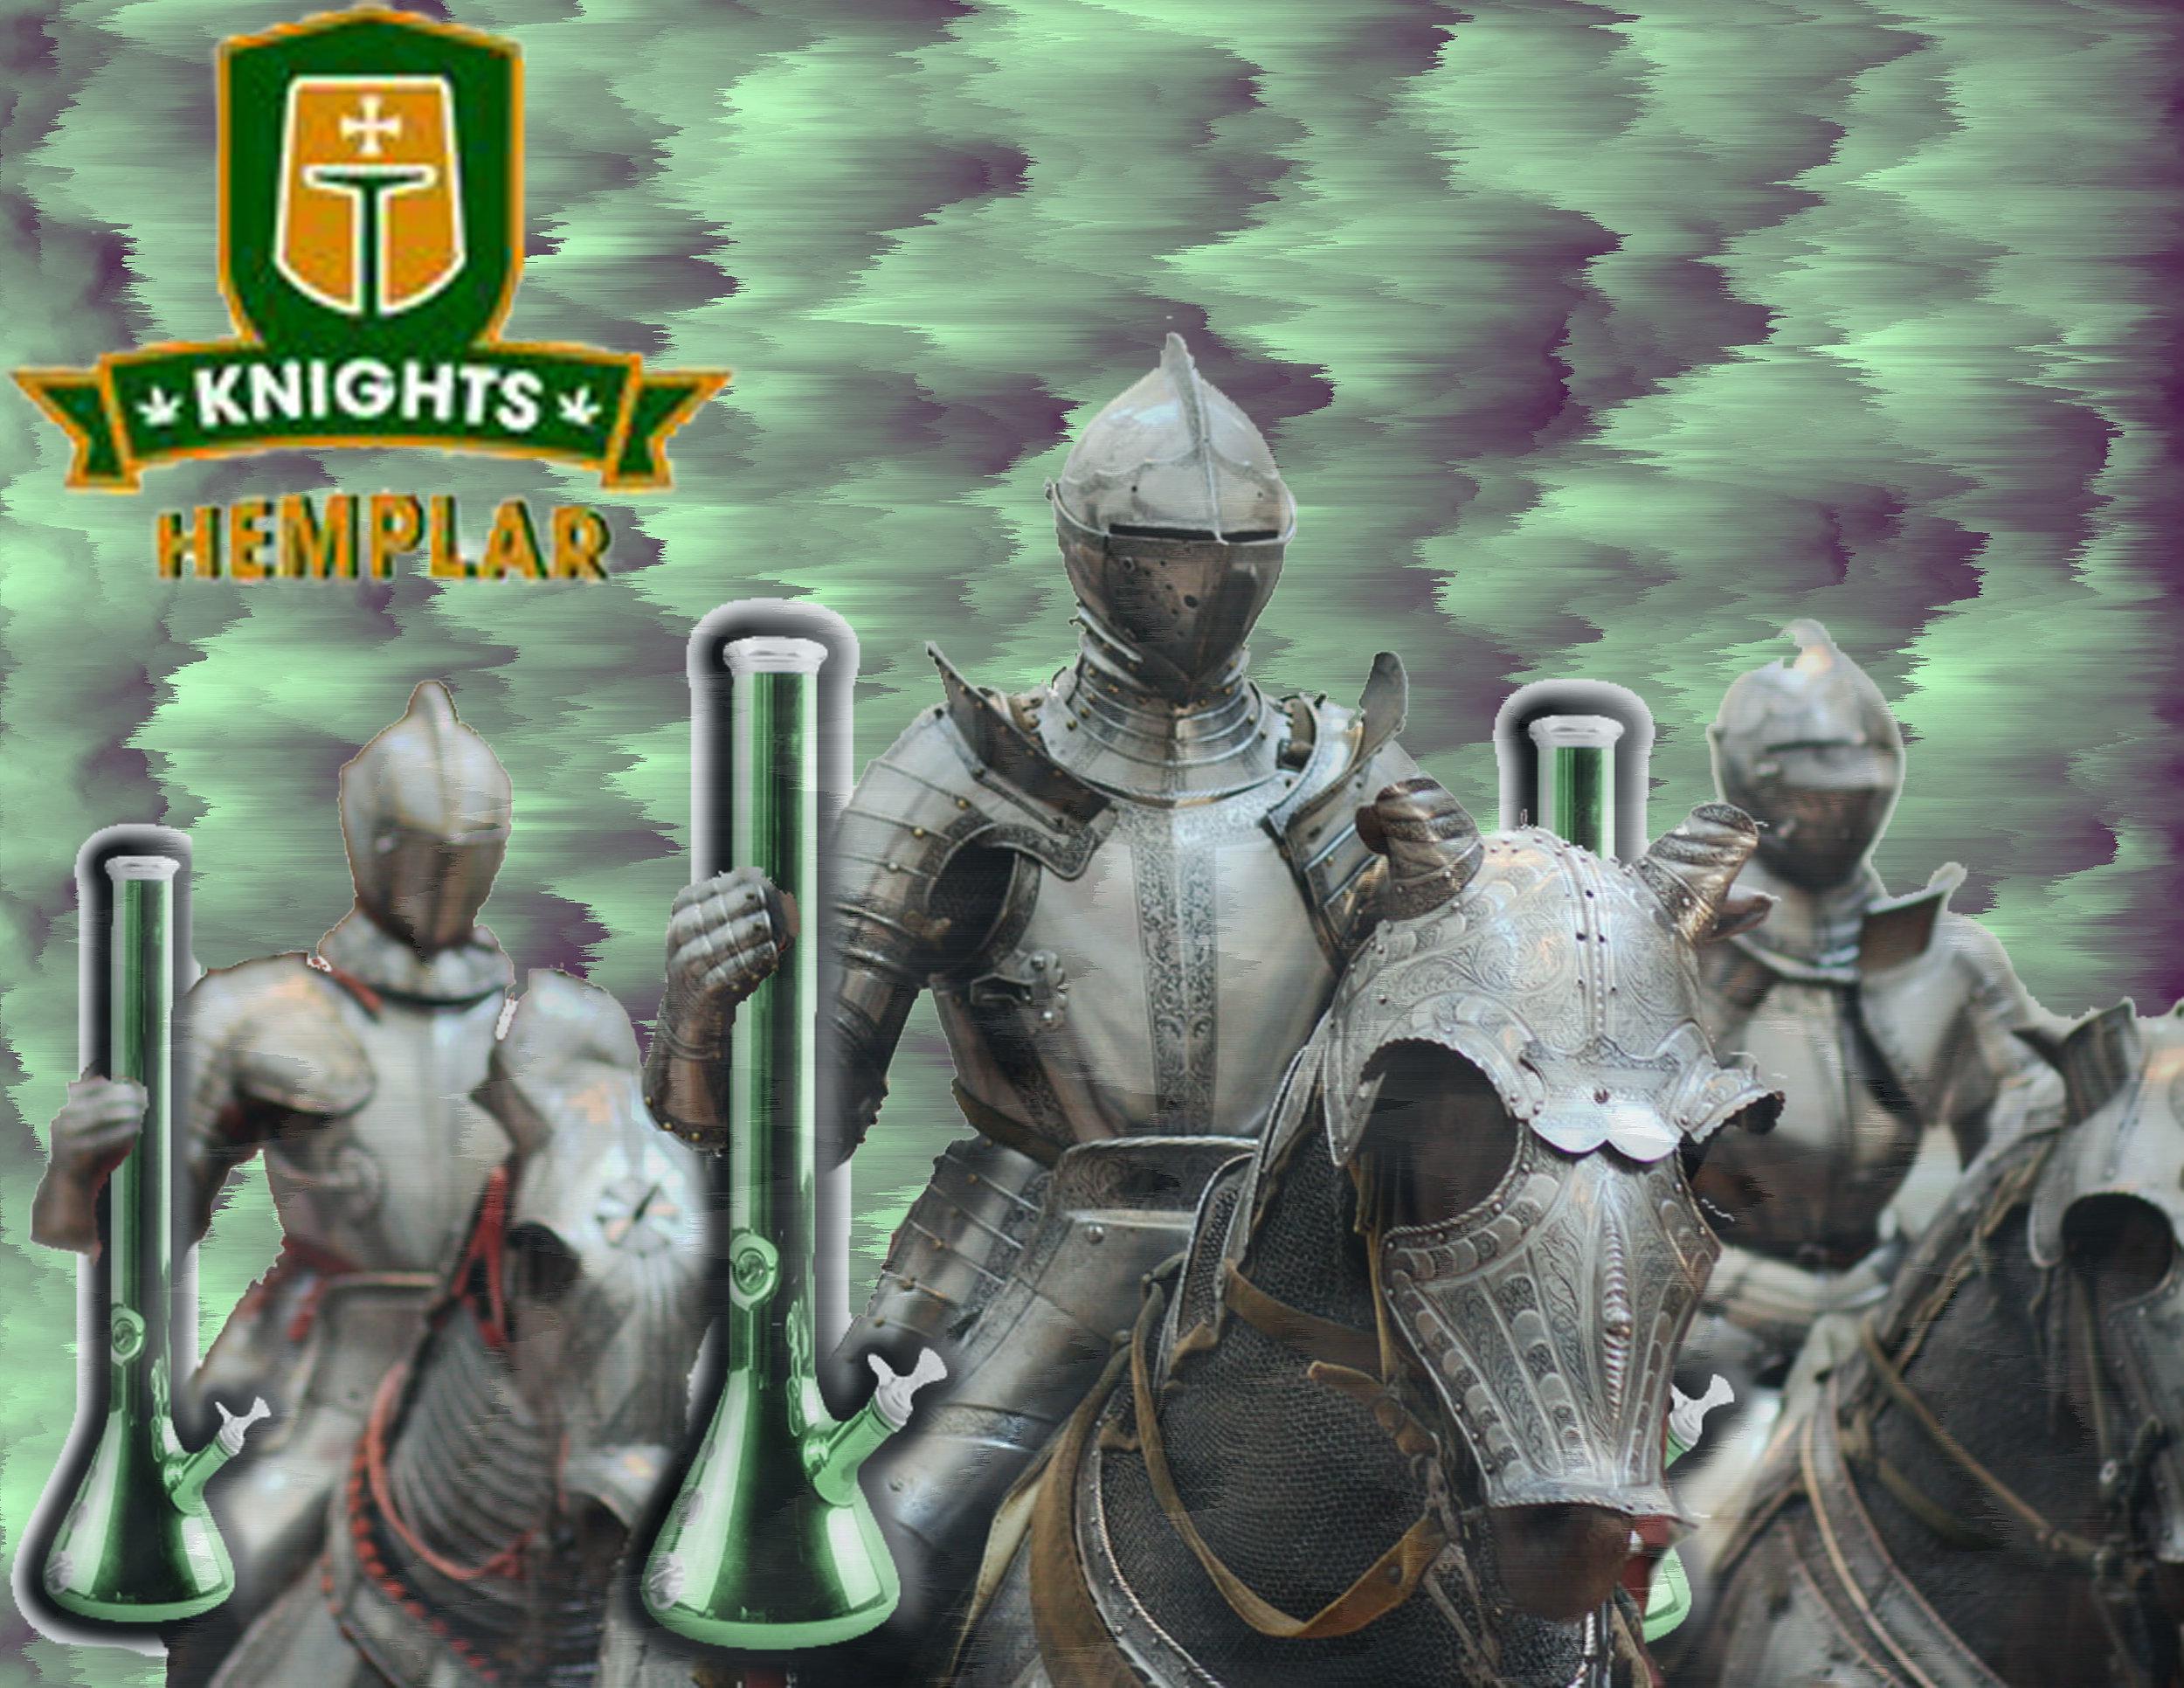 KnightsHempShirt.jpg